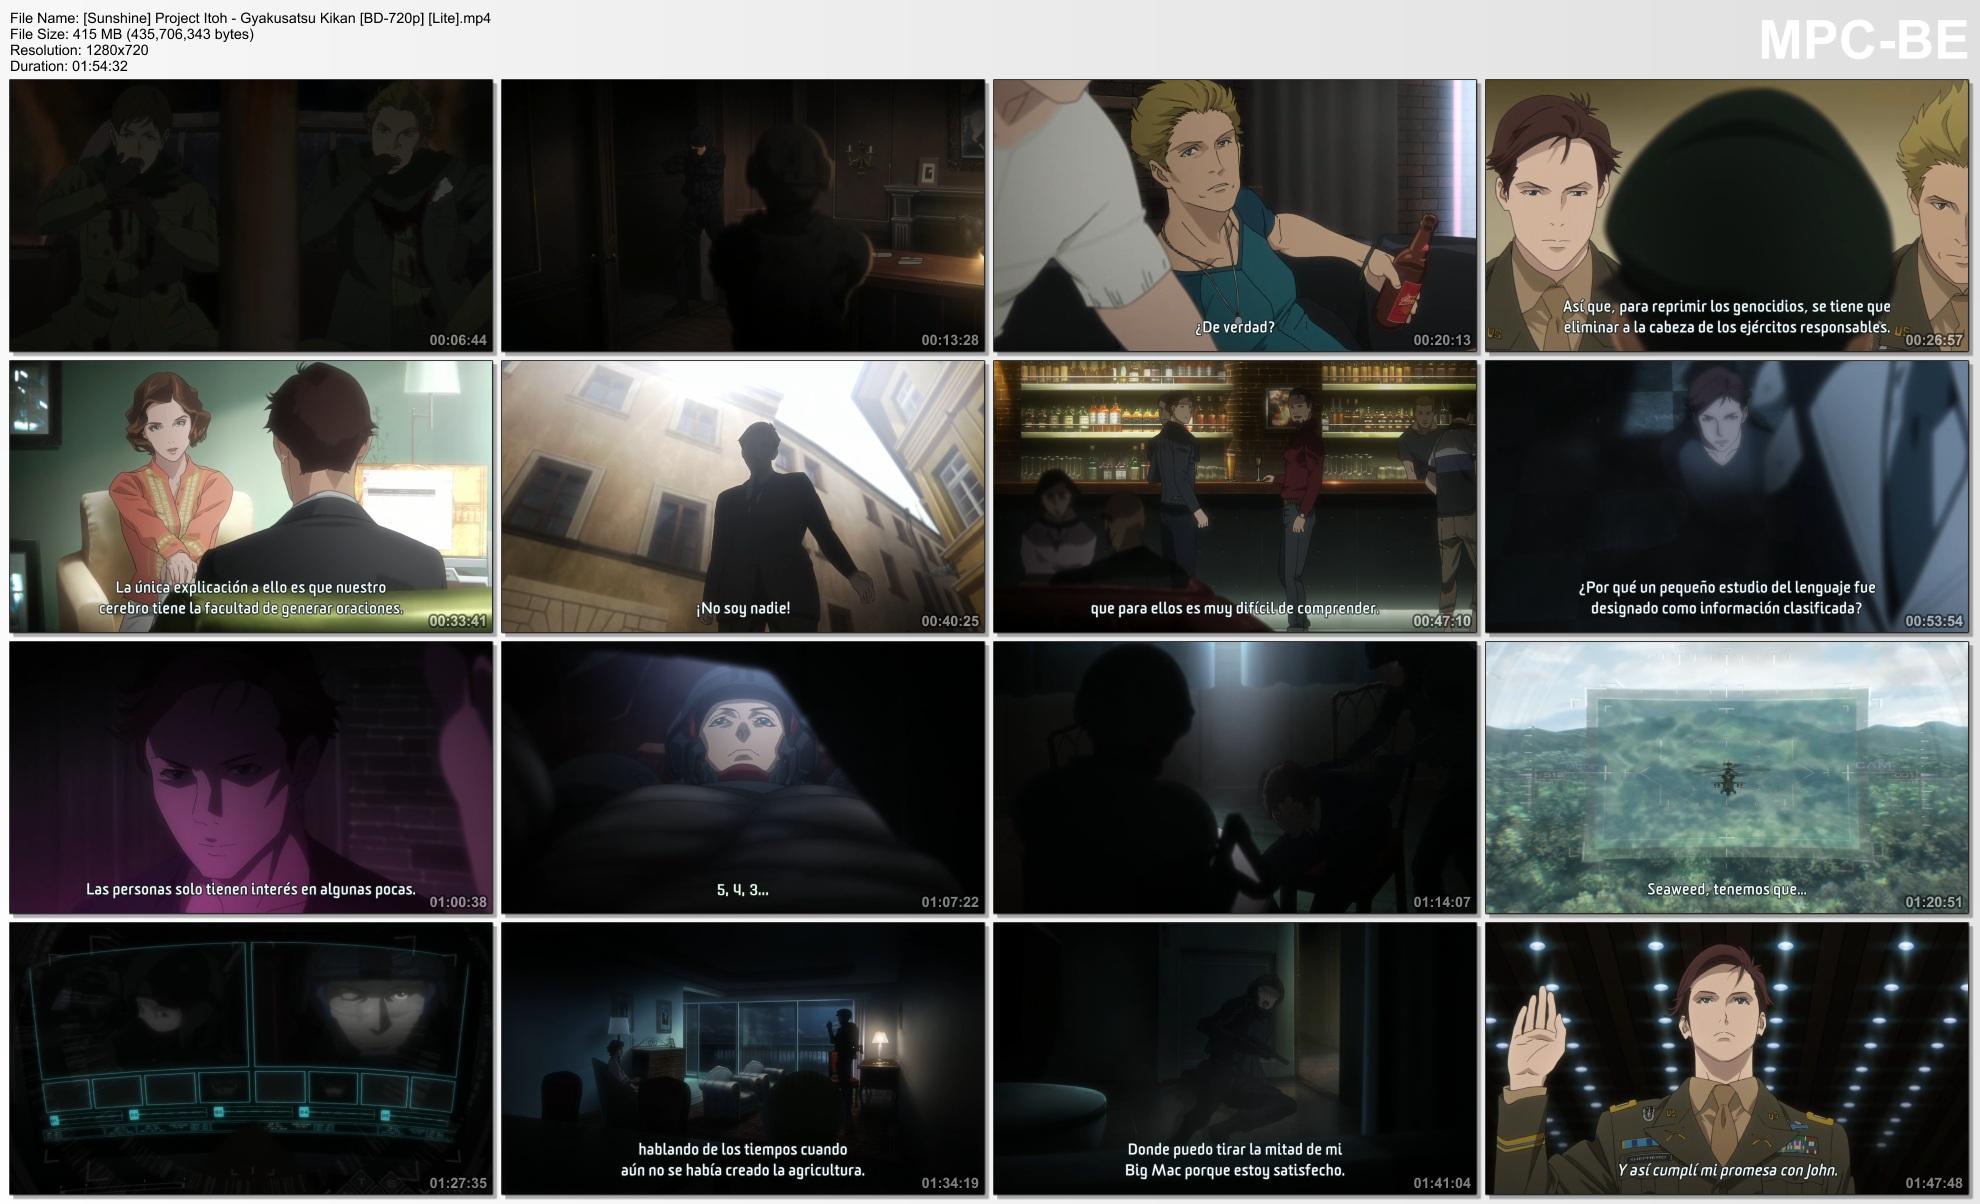 Sunshine-Project-Itoh-Gyakusatsu-Kikan-BD-720p-Lite-mp4-thumbs-2019-05-22-23-00-11 - Gyakusatsu Kikan (Genocidal Organ) [01/01] [720p] [BD] [415MB] [Mega] - Anime Ligero [Descargas]